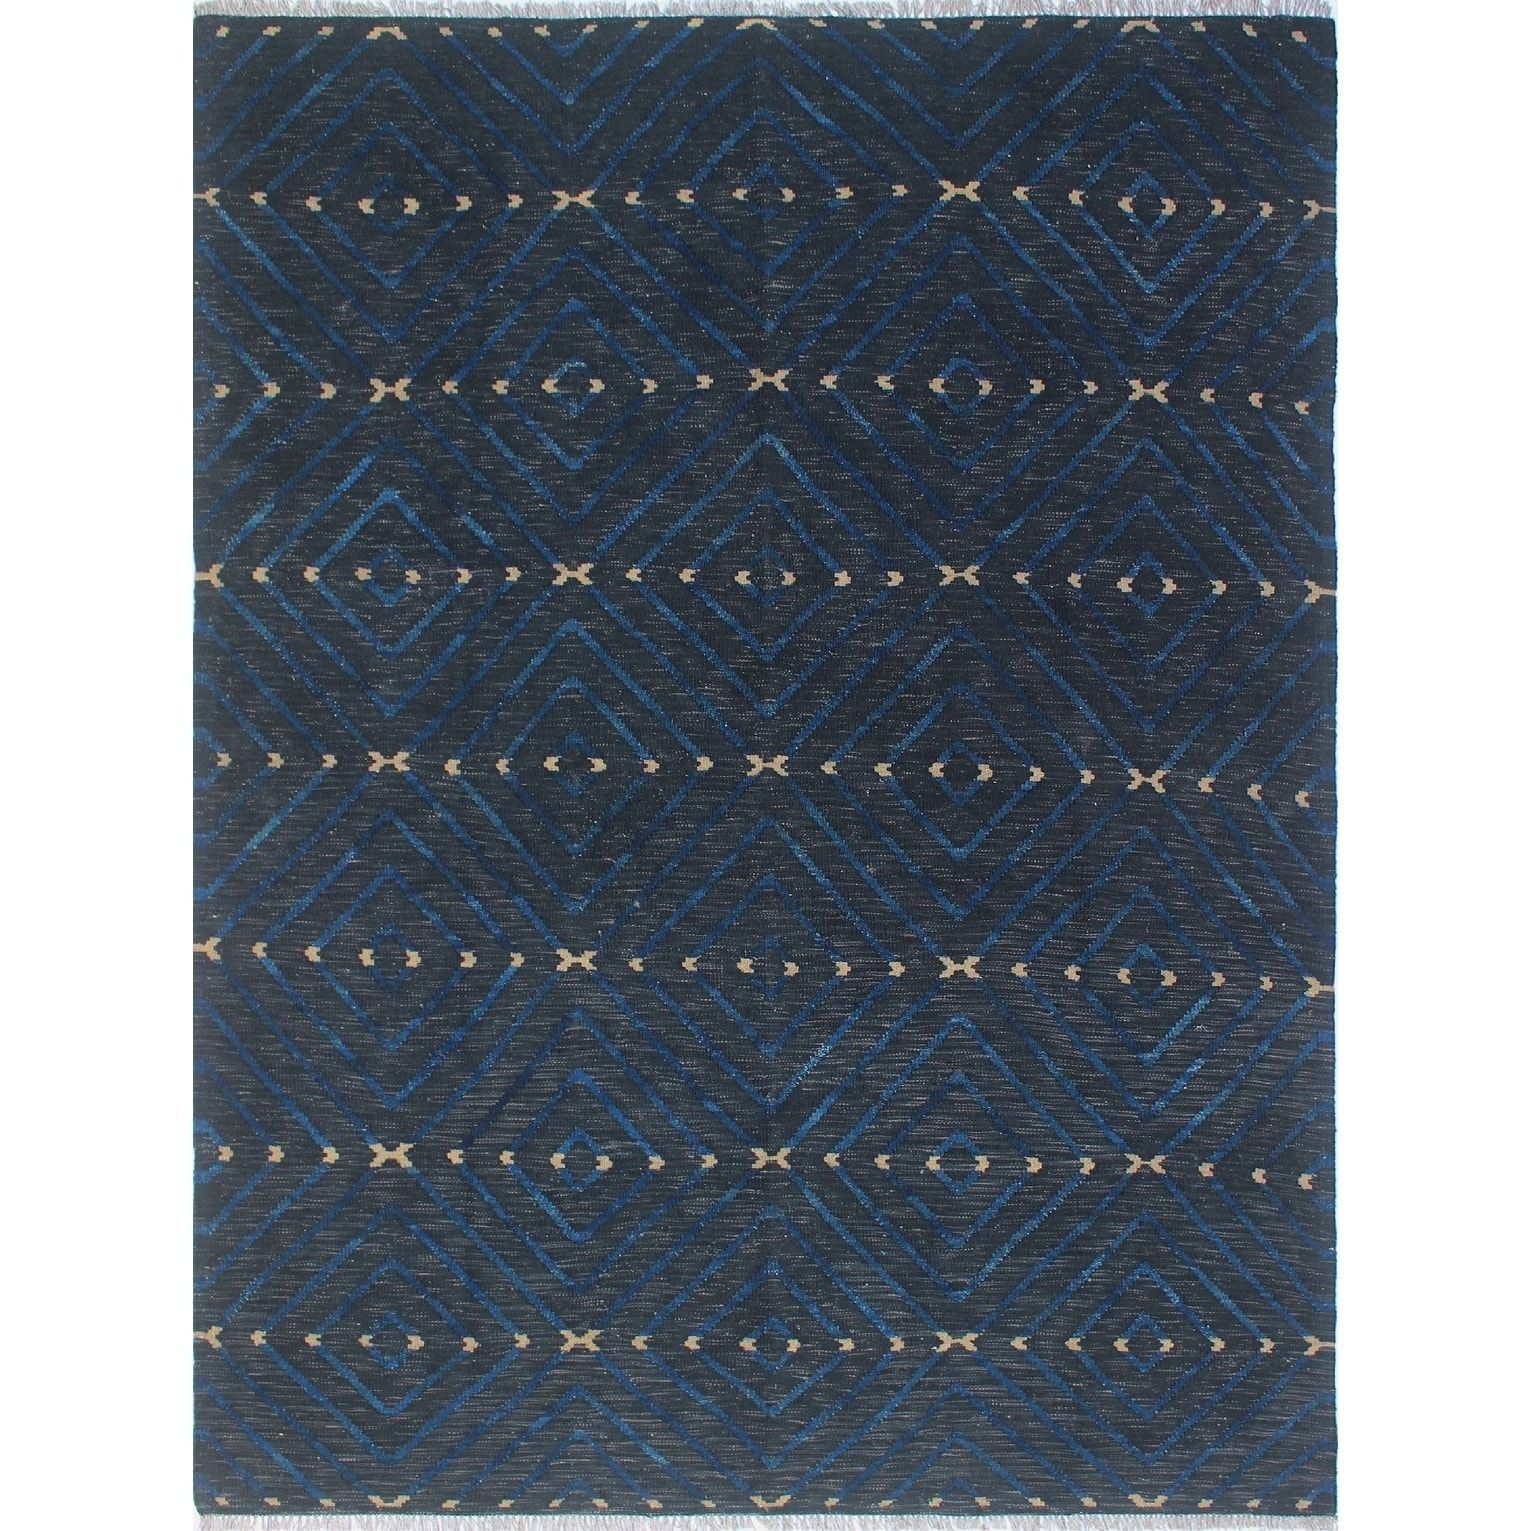 Winchester Zahida Black/Blue Rug (5'10 x 7'10), Size 6' x 8' (Wool